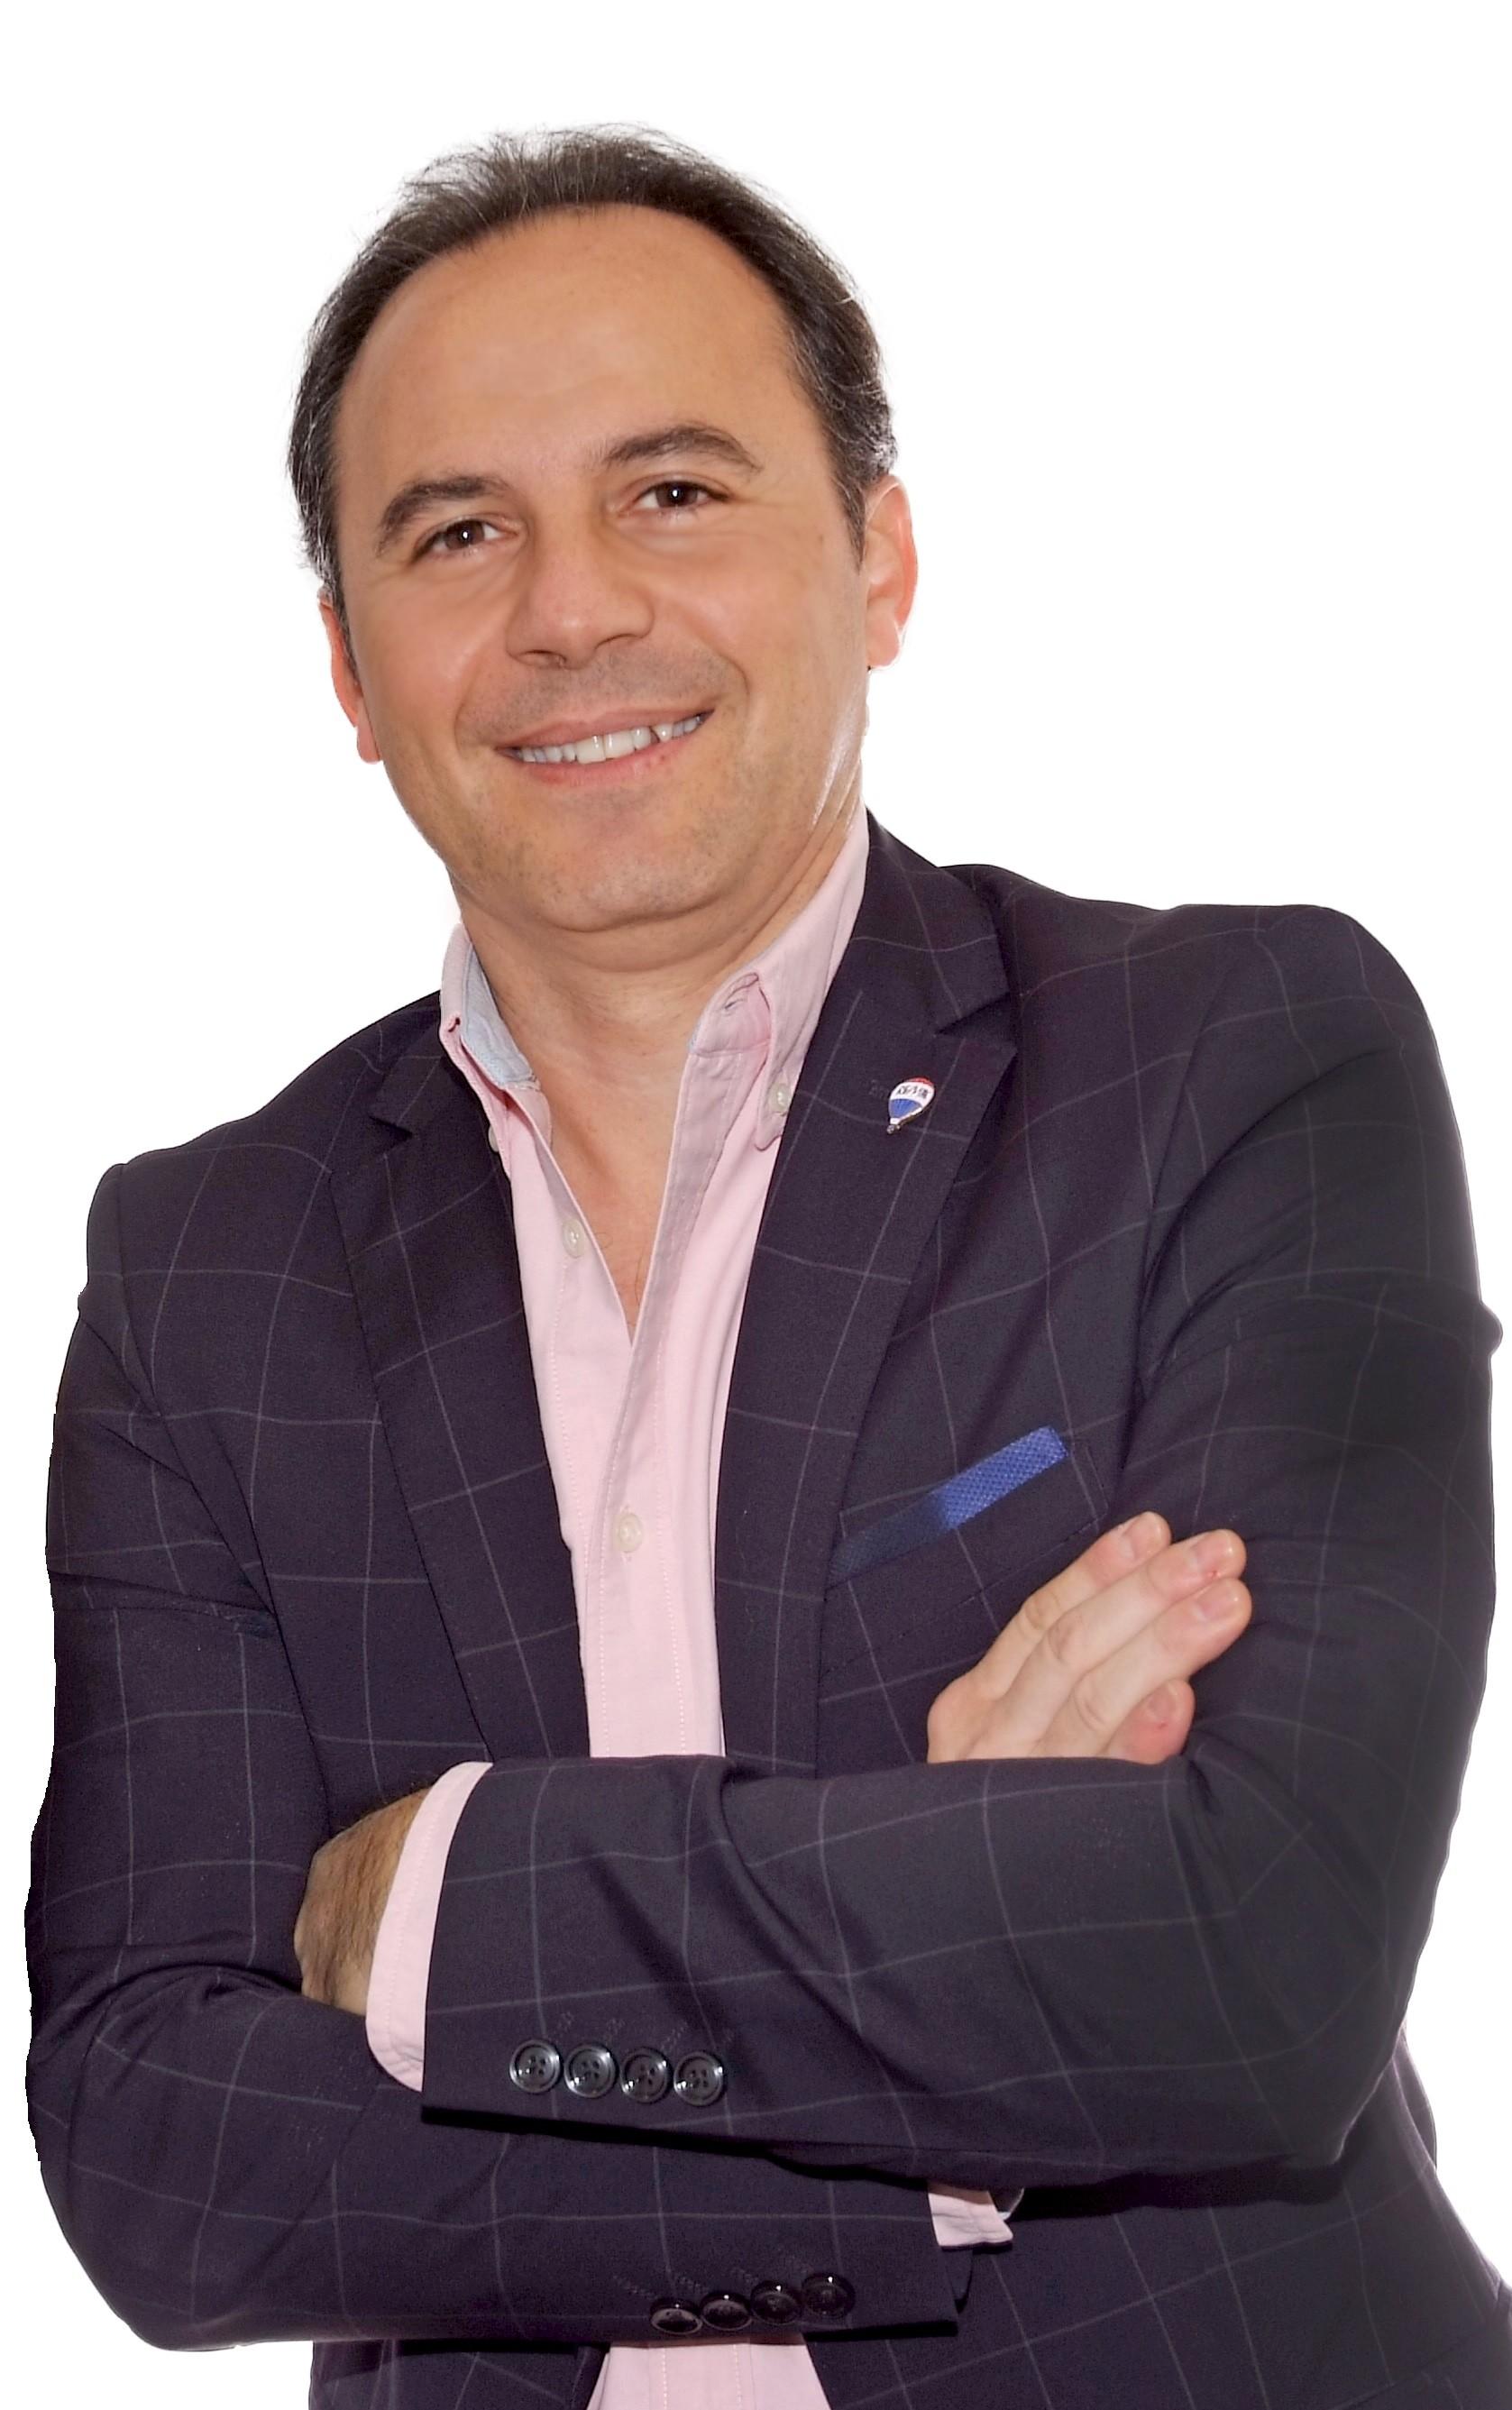 Pedro Mesas Oyuela